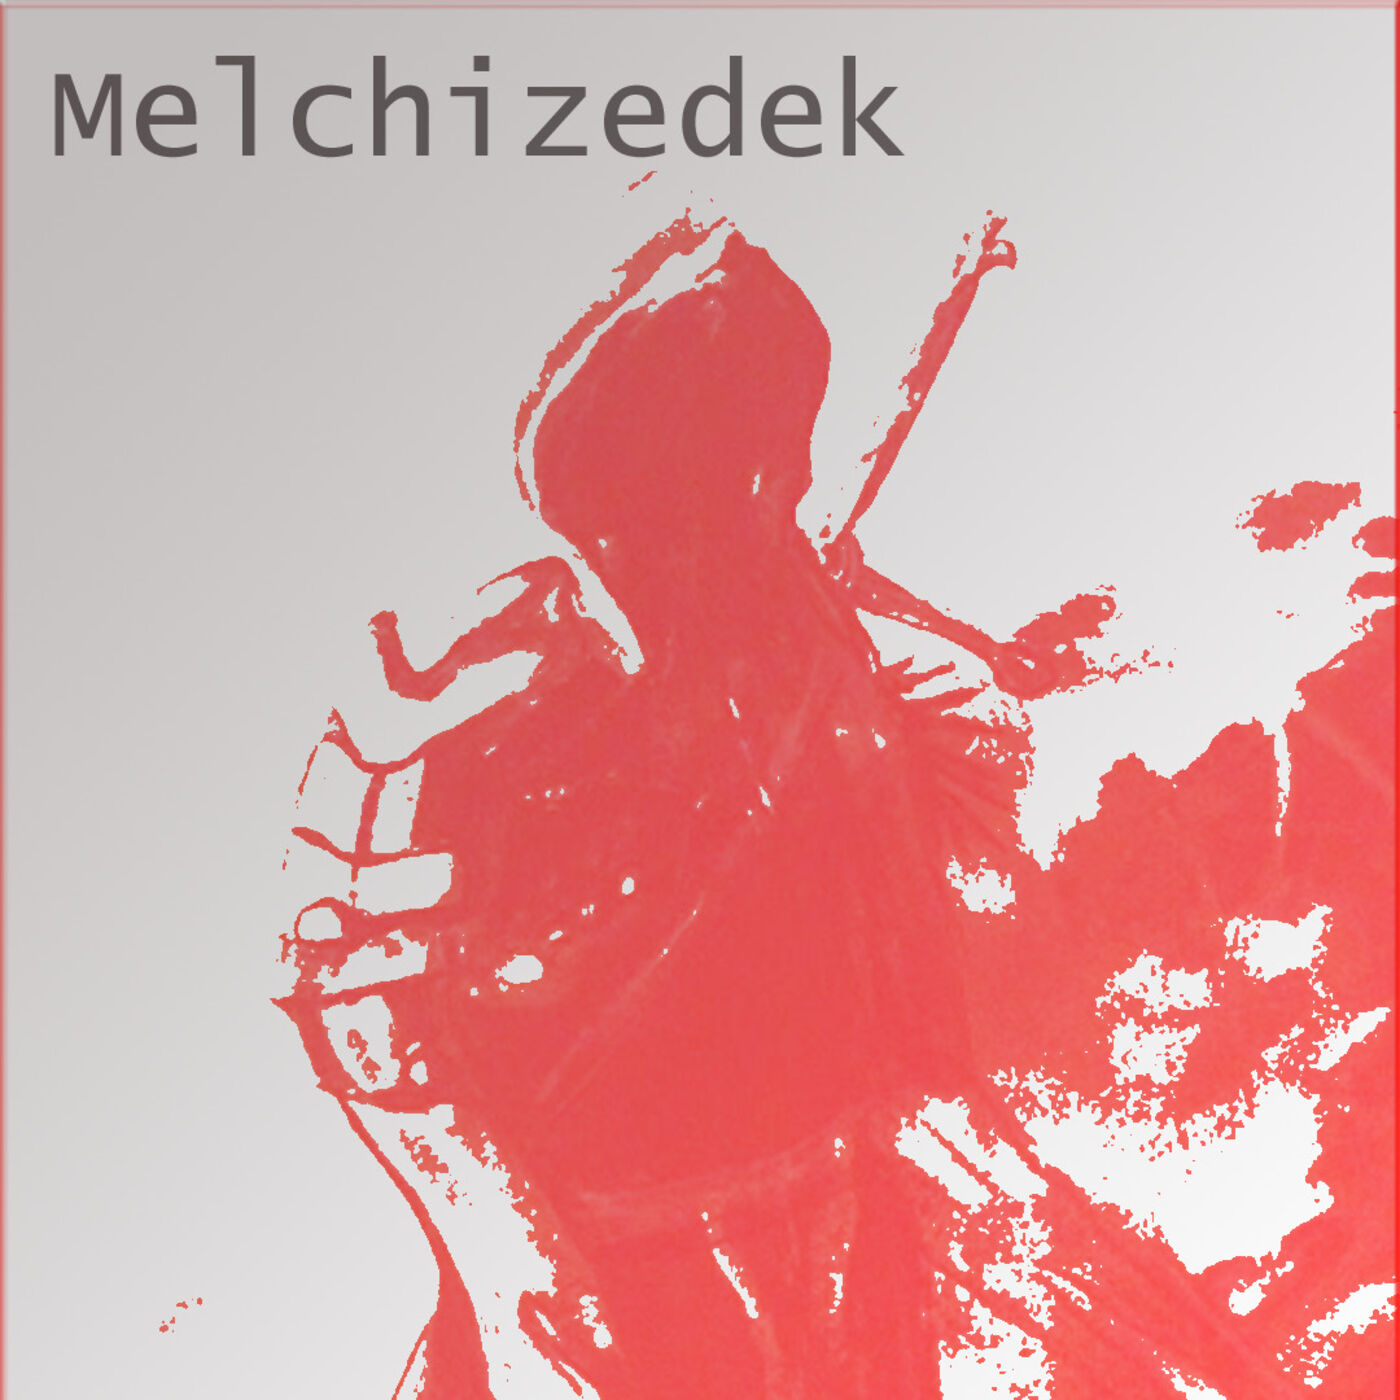 Melchizedek: Priest and King (Vespers)